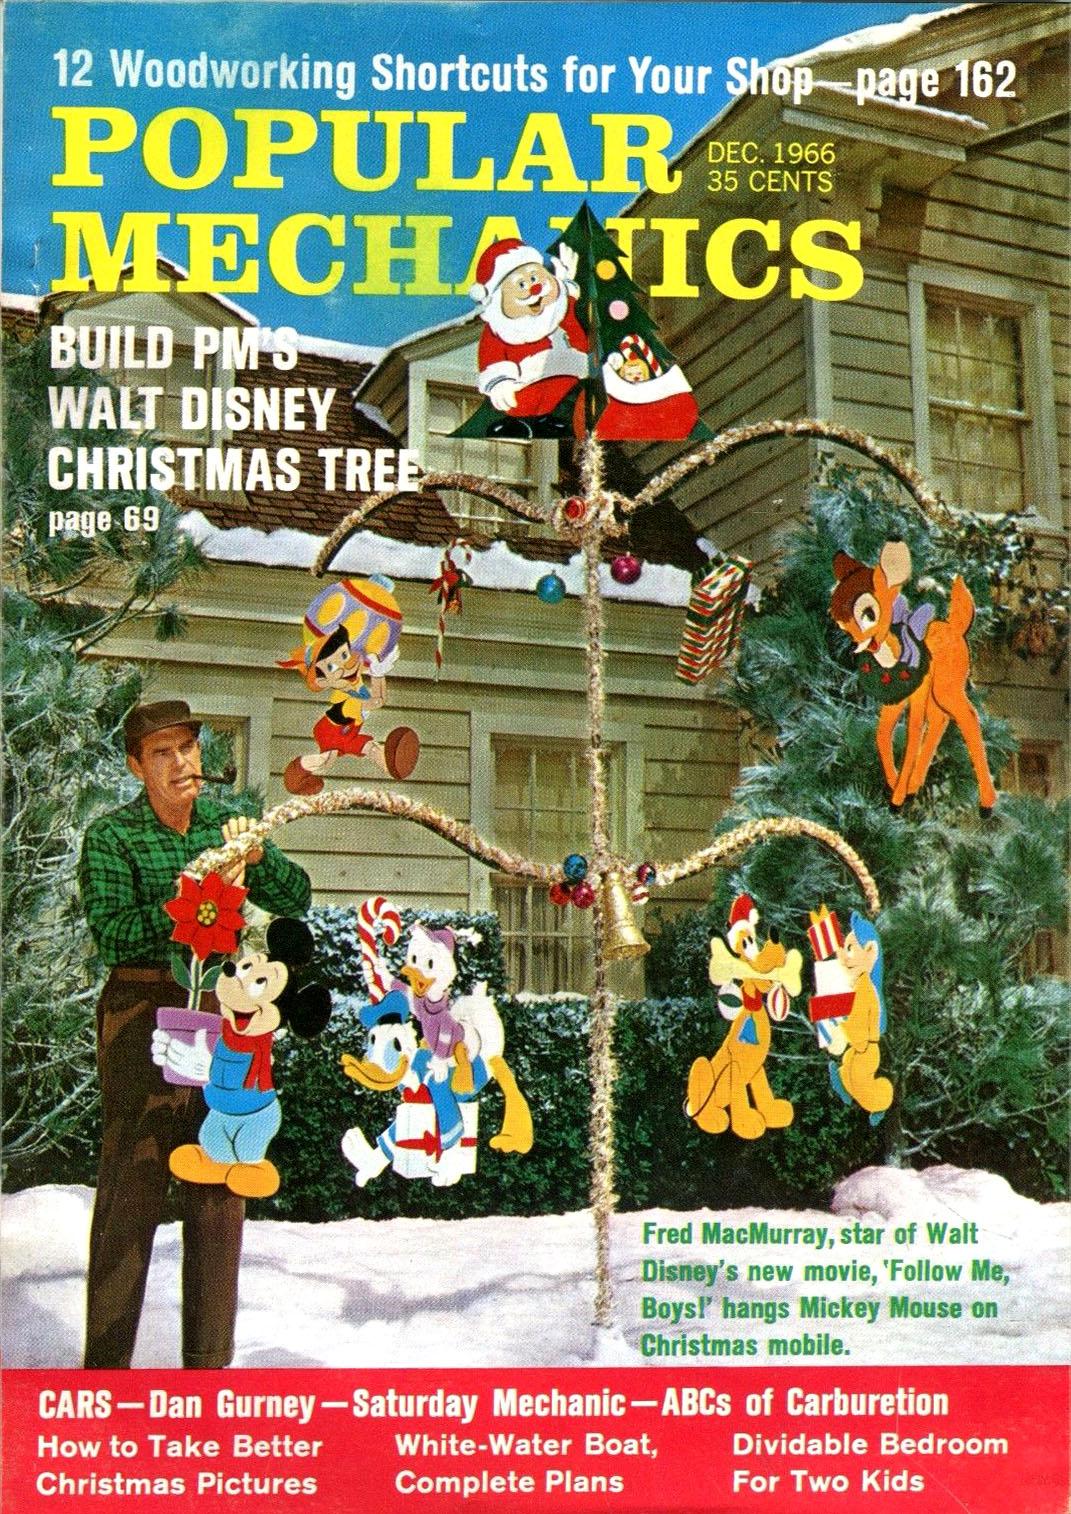 Popular-Mechanics-Magazine-December-1966.jpg